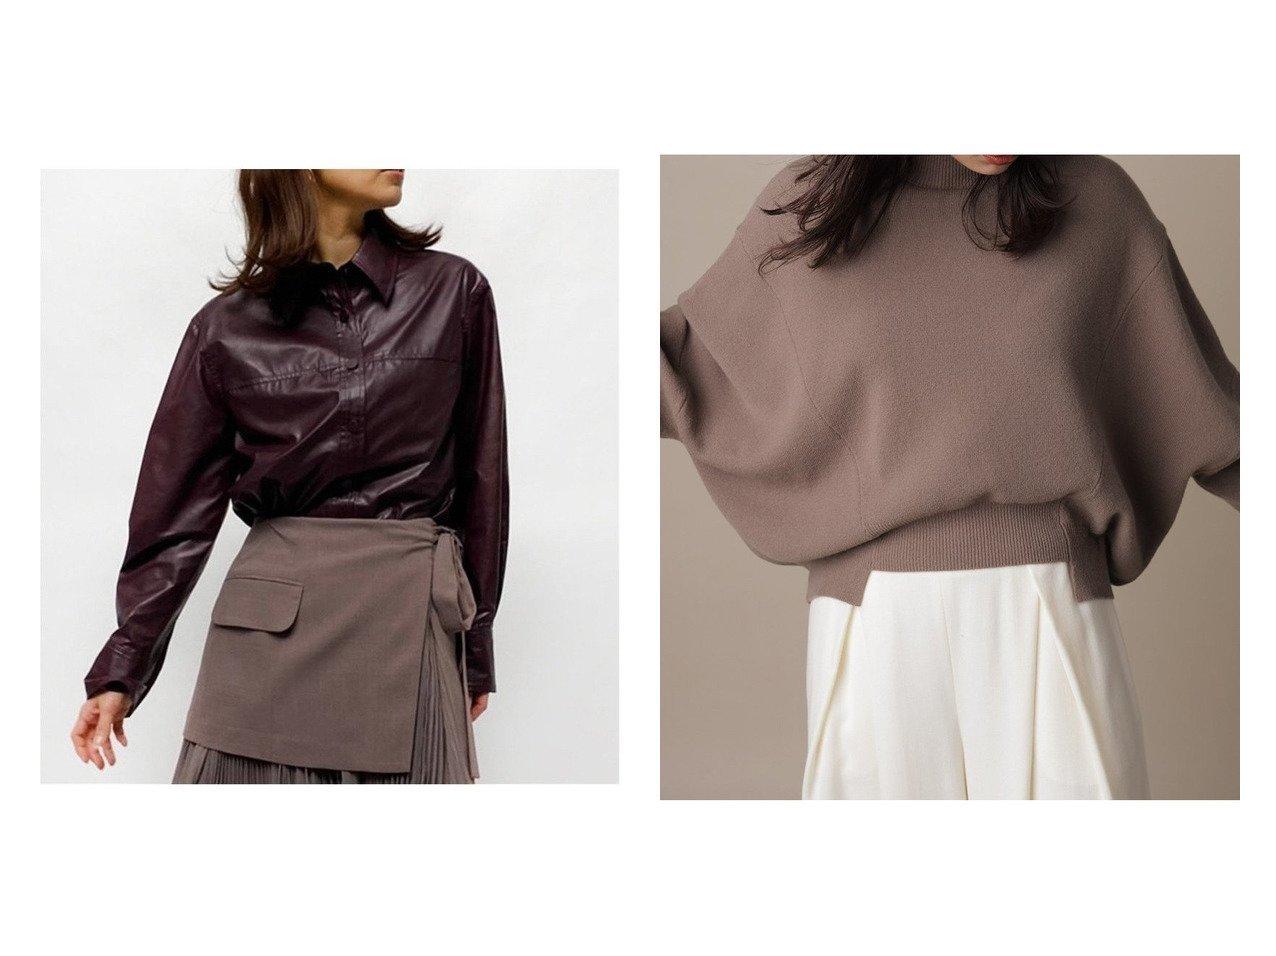 【FRAY I.D/フレイ アイディー】のレザーオーバーシャツ&ハイネックルーズニットプルオーバー トップス・カットソーのおすすめ!人気、トレンド・レディースファッションの通販  おすすめで人気の流行・トレンド、ファッションの通販商品 メンズファッション・キッズファッション・インテリア・家具・レディースファッション・服の通販 founy(ファニー) https://founy.com/ ファッション Fashion レディースファッション WOMEN トップス Tops Tshirt シャツ/ブラウス Shirts Blouses ニット Knit Tops プルオーバー Pullover フェイクレザー ボトム マニッシュ ミックス 長袖 カッティング スウェット ハイネック フィット リラックス  ID:crp329100000010666